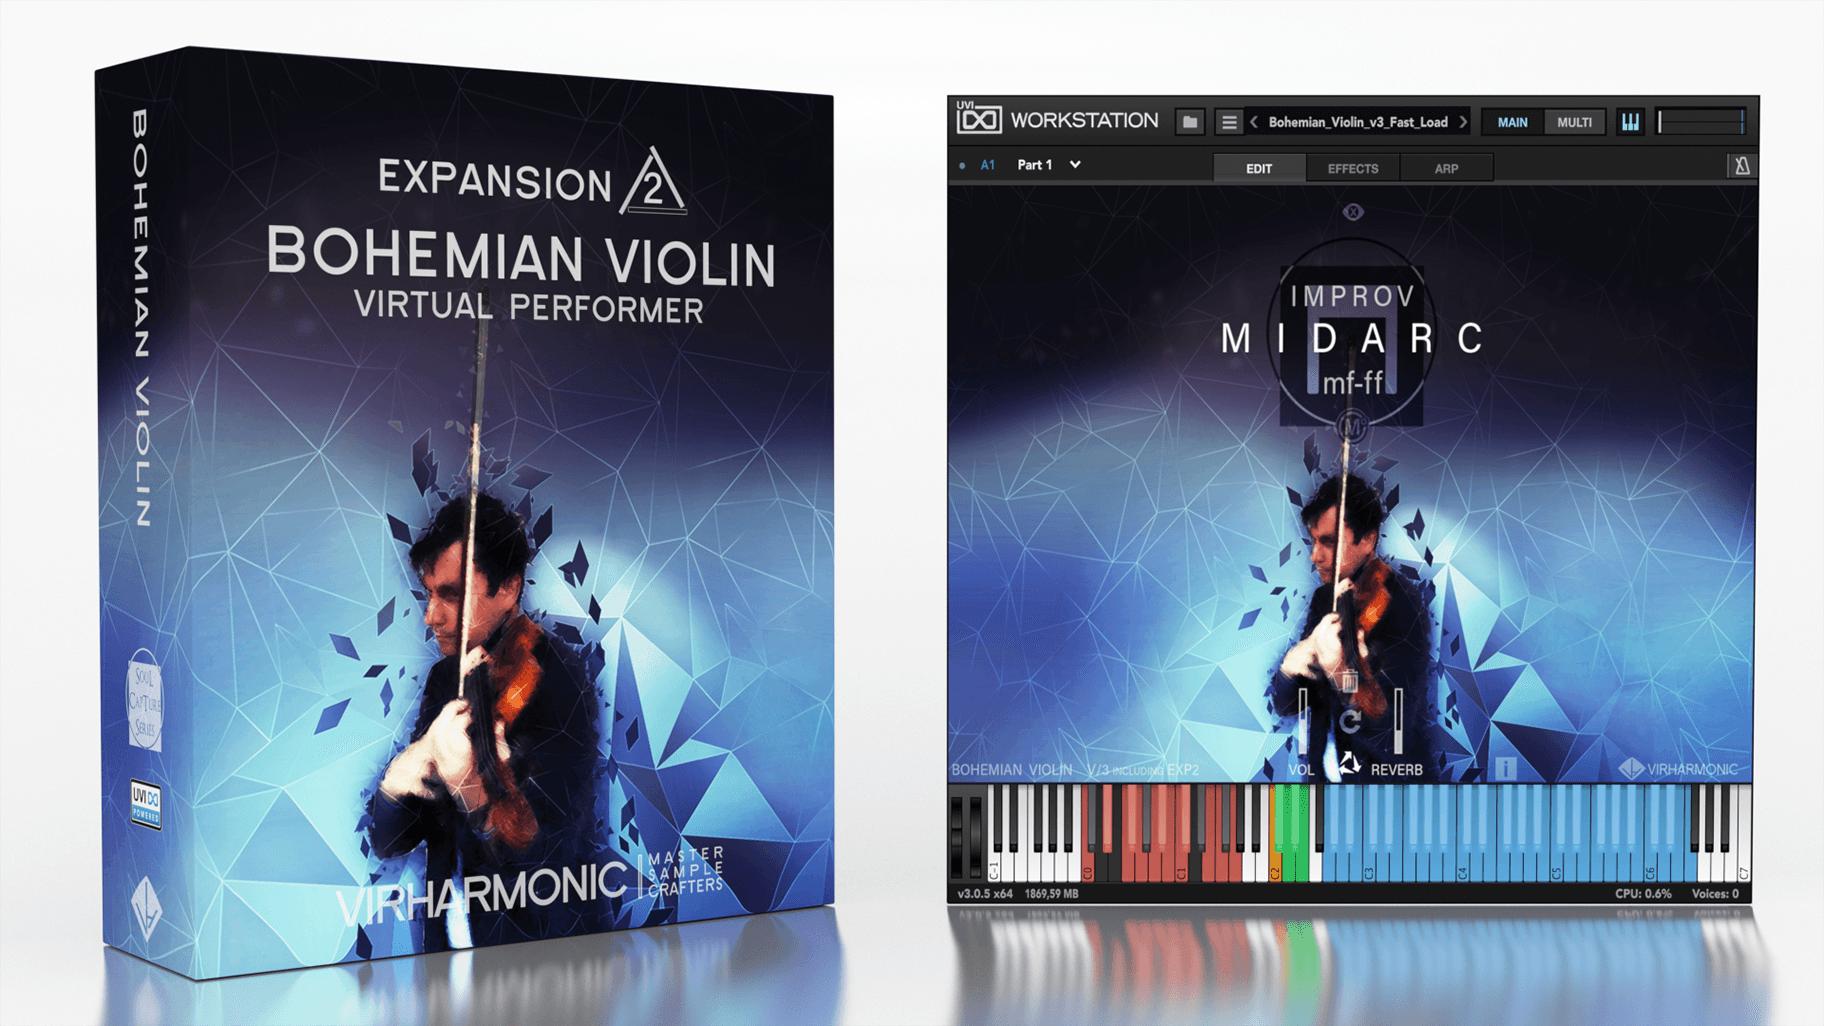 Bohemian Violin Expansion 2